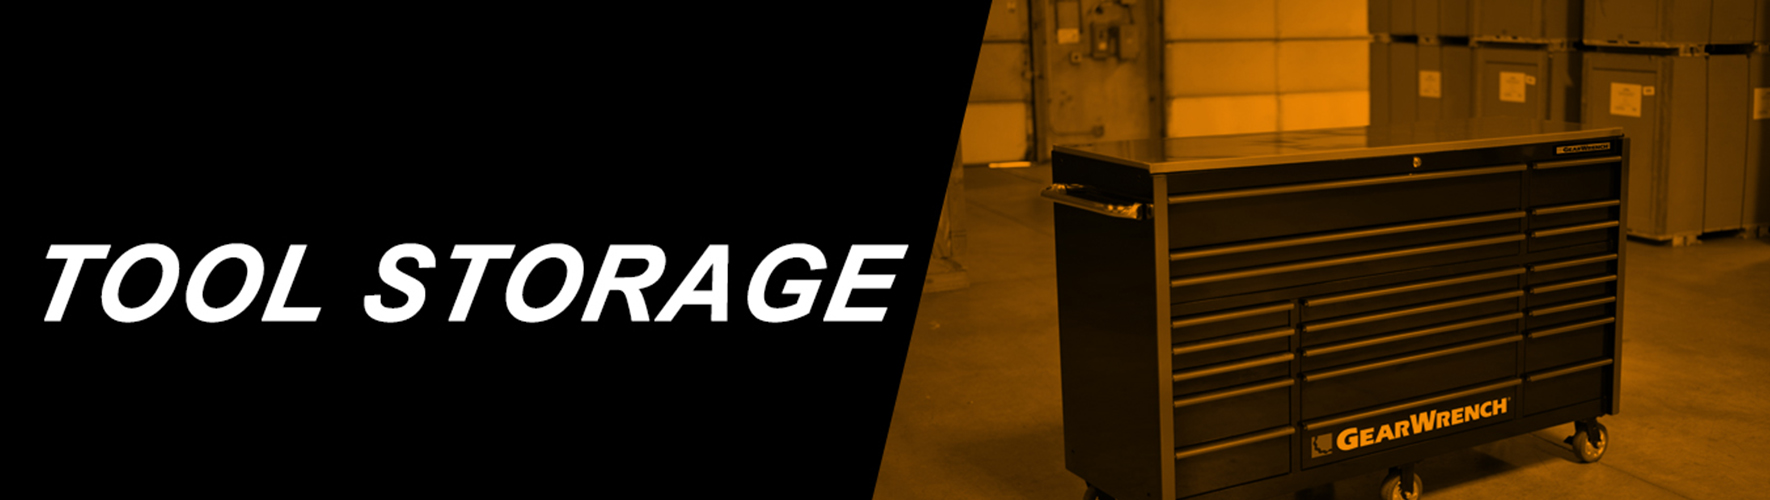 Tool-Storage